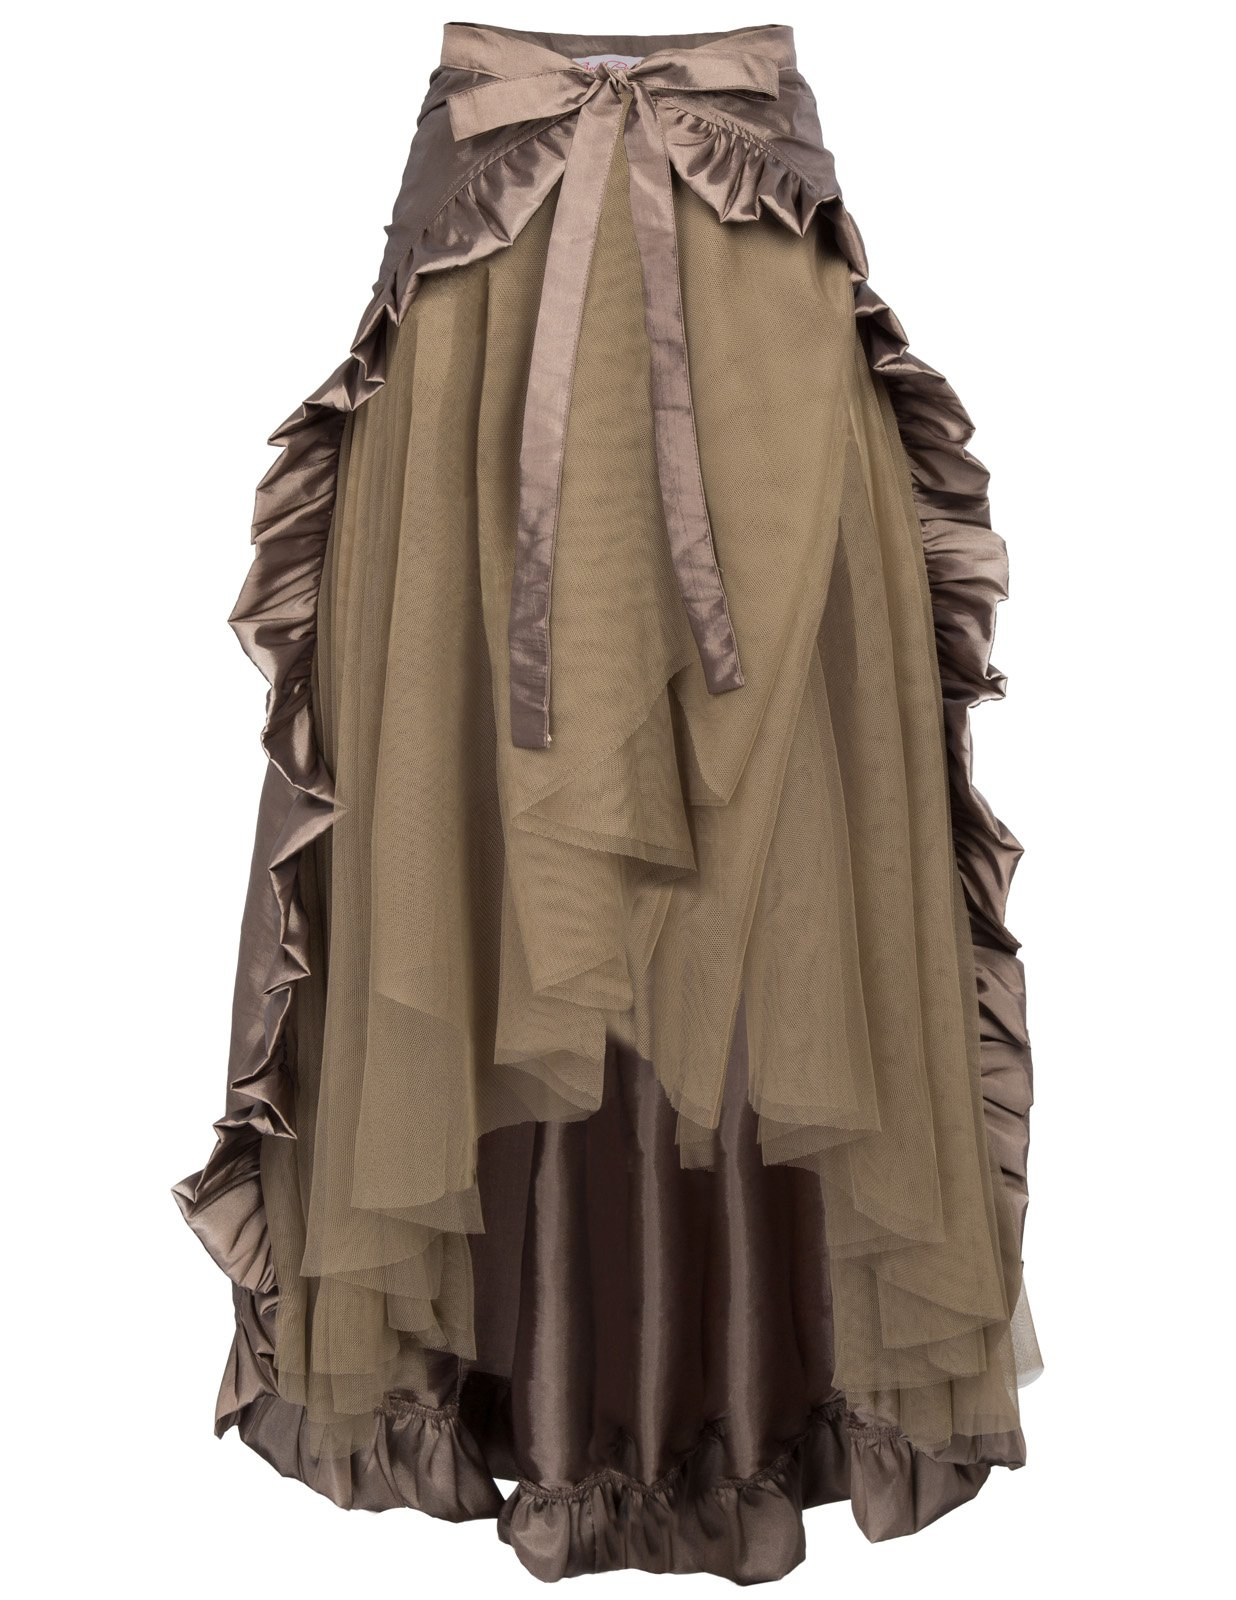 Steampunk Victorian Renaissance Pirate Skirt Bustle Style BP000206-2 MCoffee